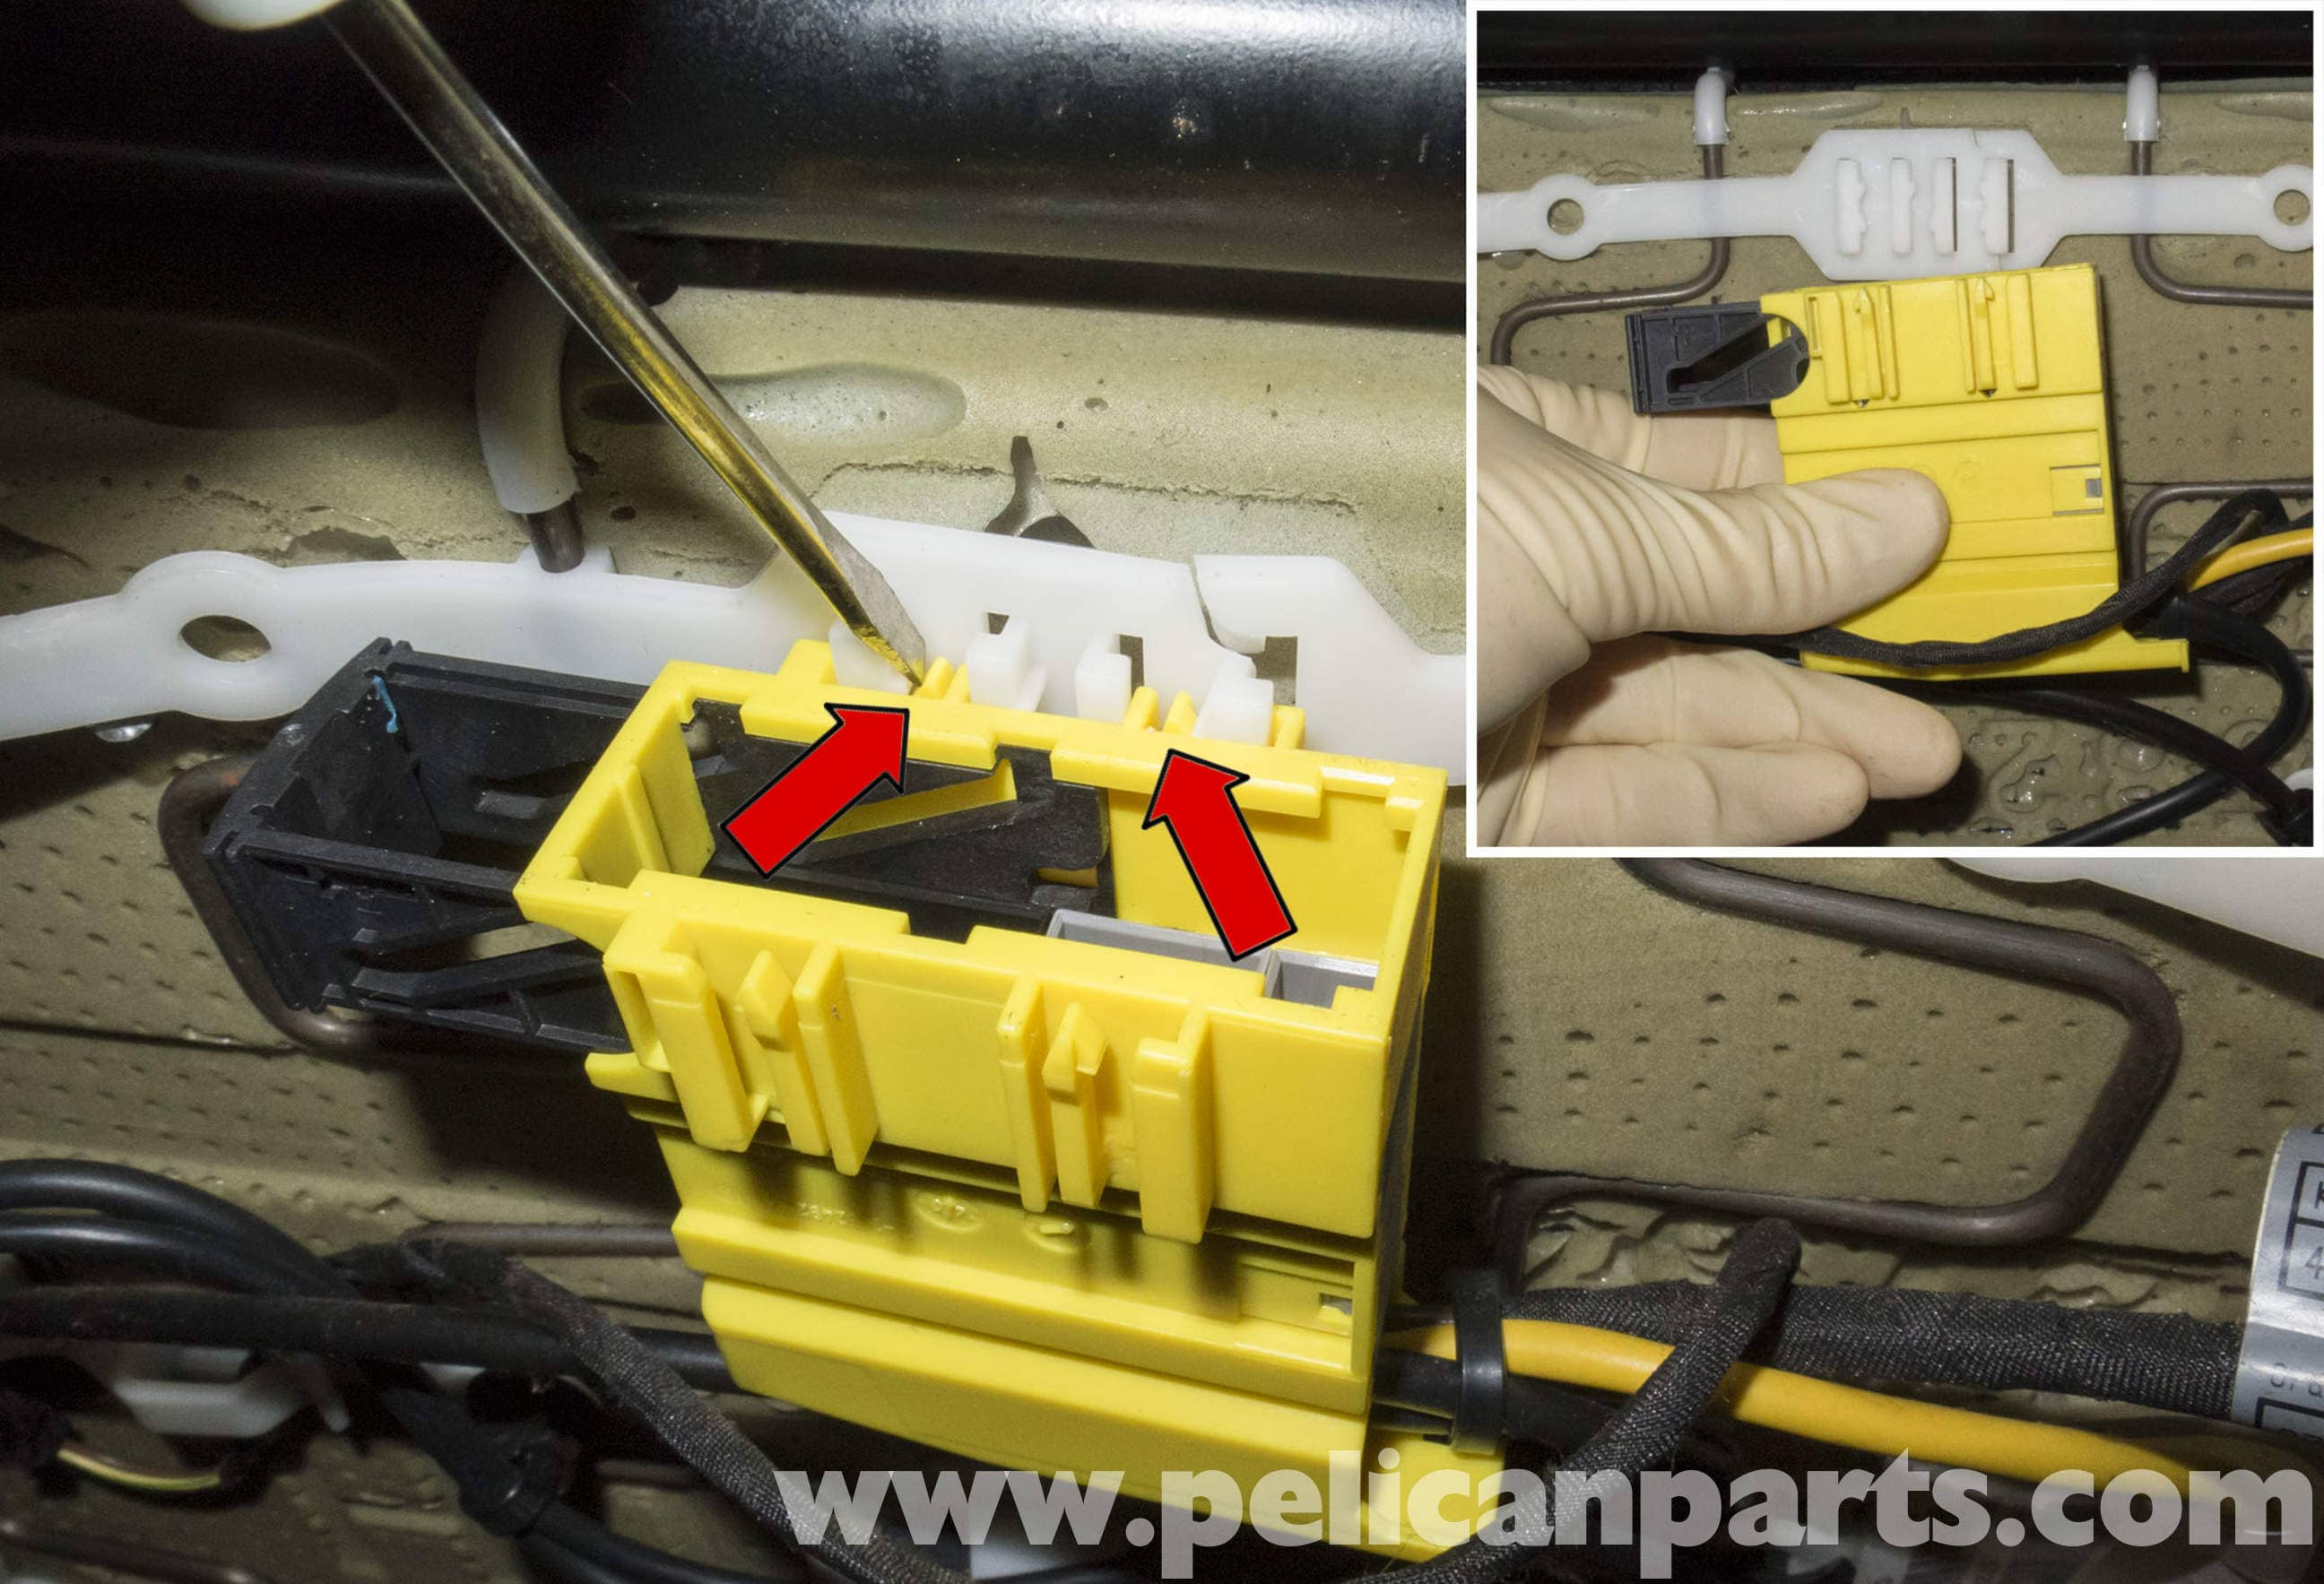 pic02 R Wiring Harness on best street rod, fuel pump, hot rod, fog light, universal painless,